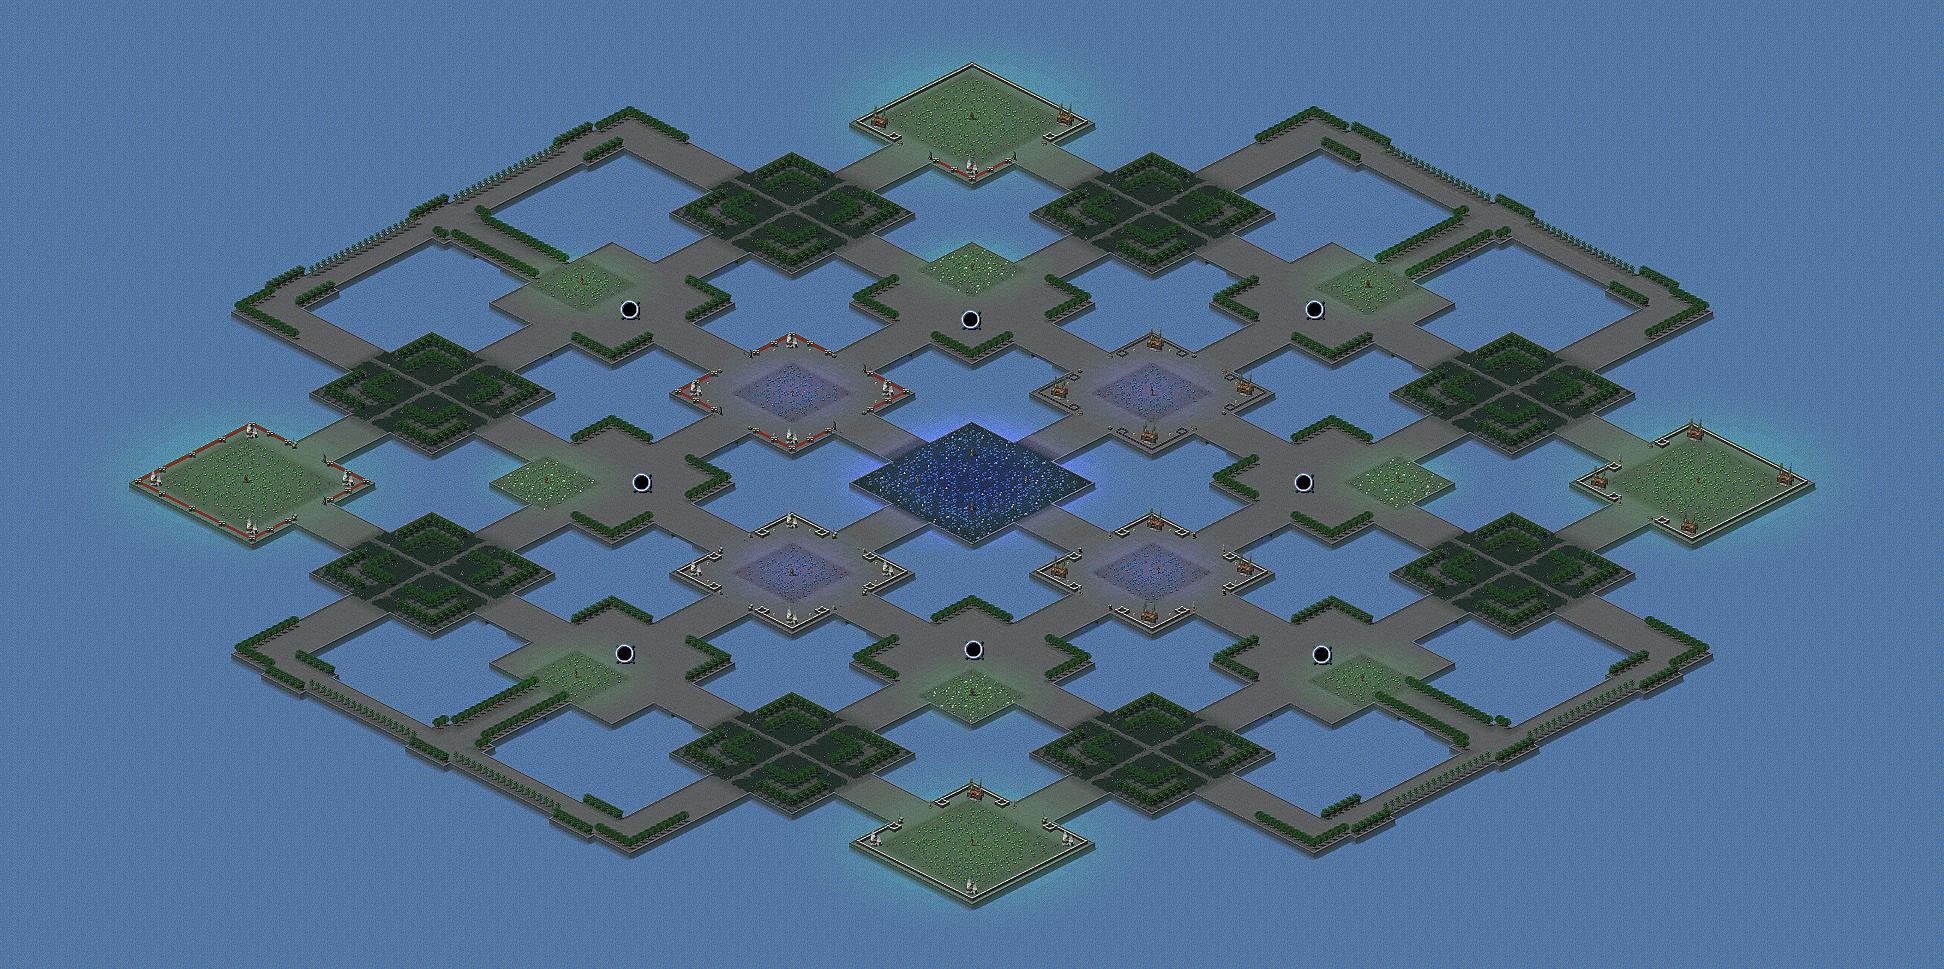 [8] Grid Gardens